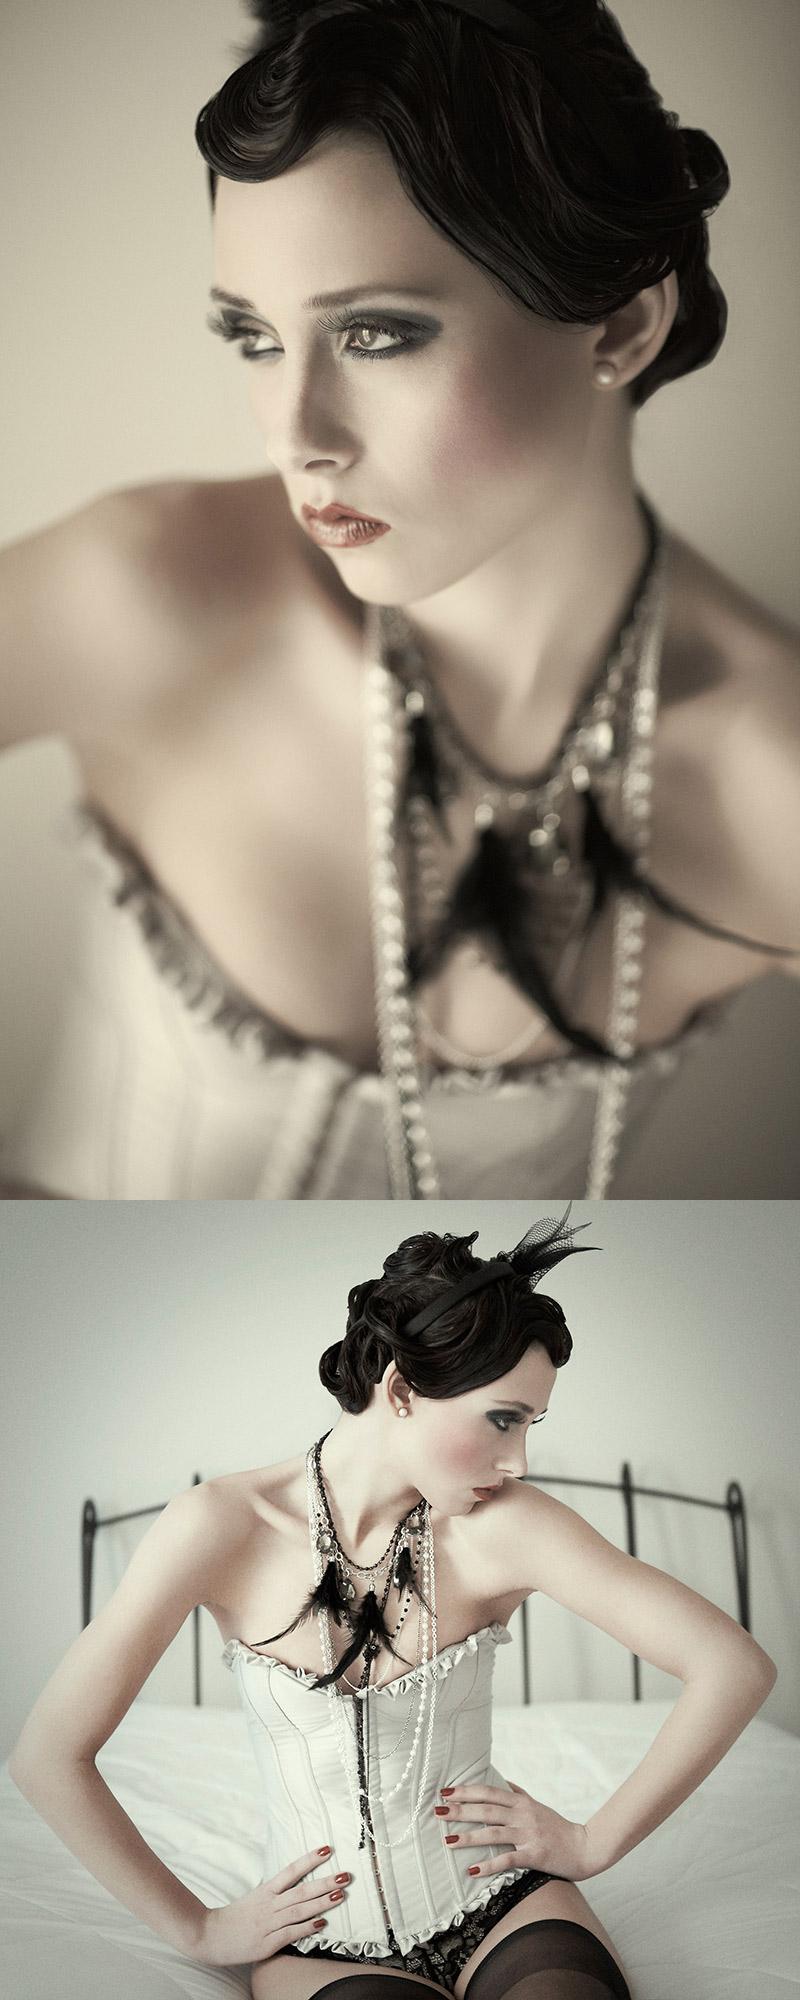 Apr 08, 2009 2009 VanKou Photography, LLC